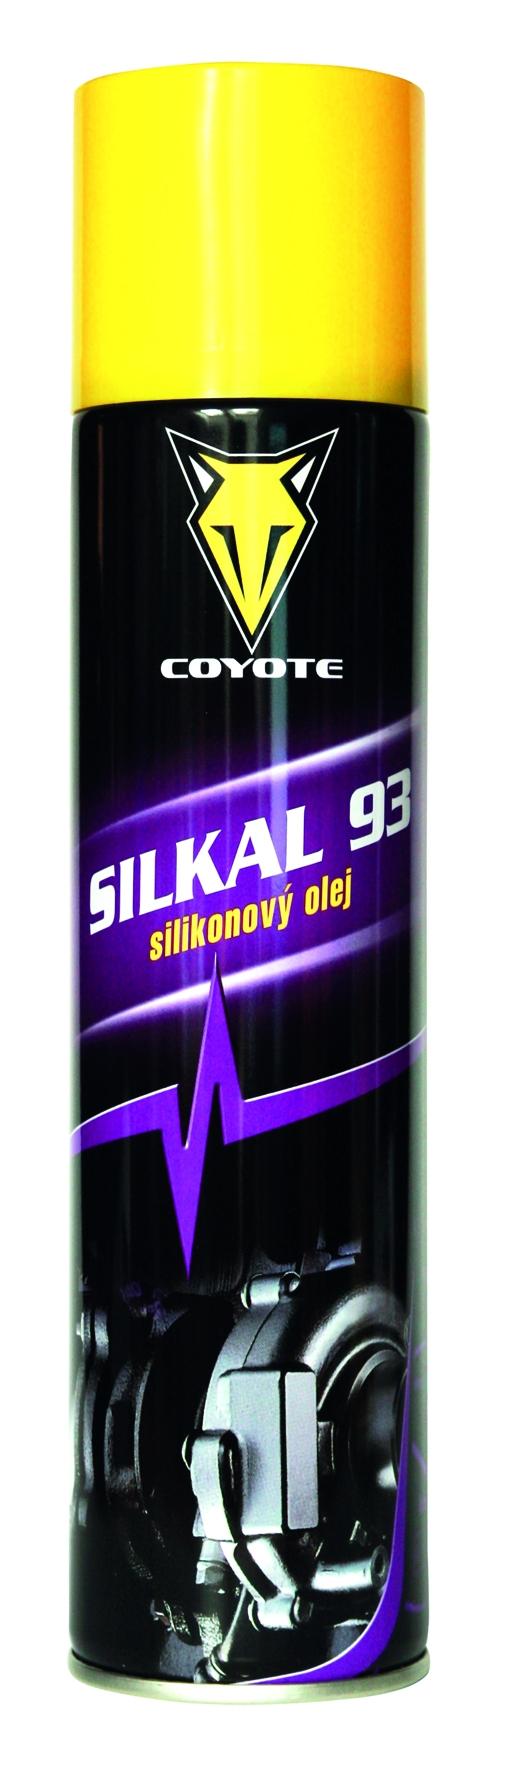 SILKAL 93 sprej 400 ml - 5172